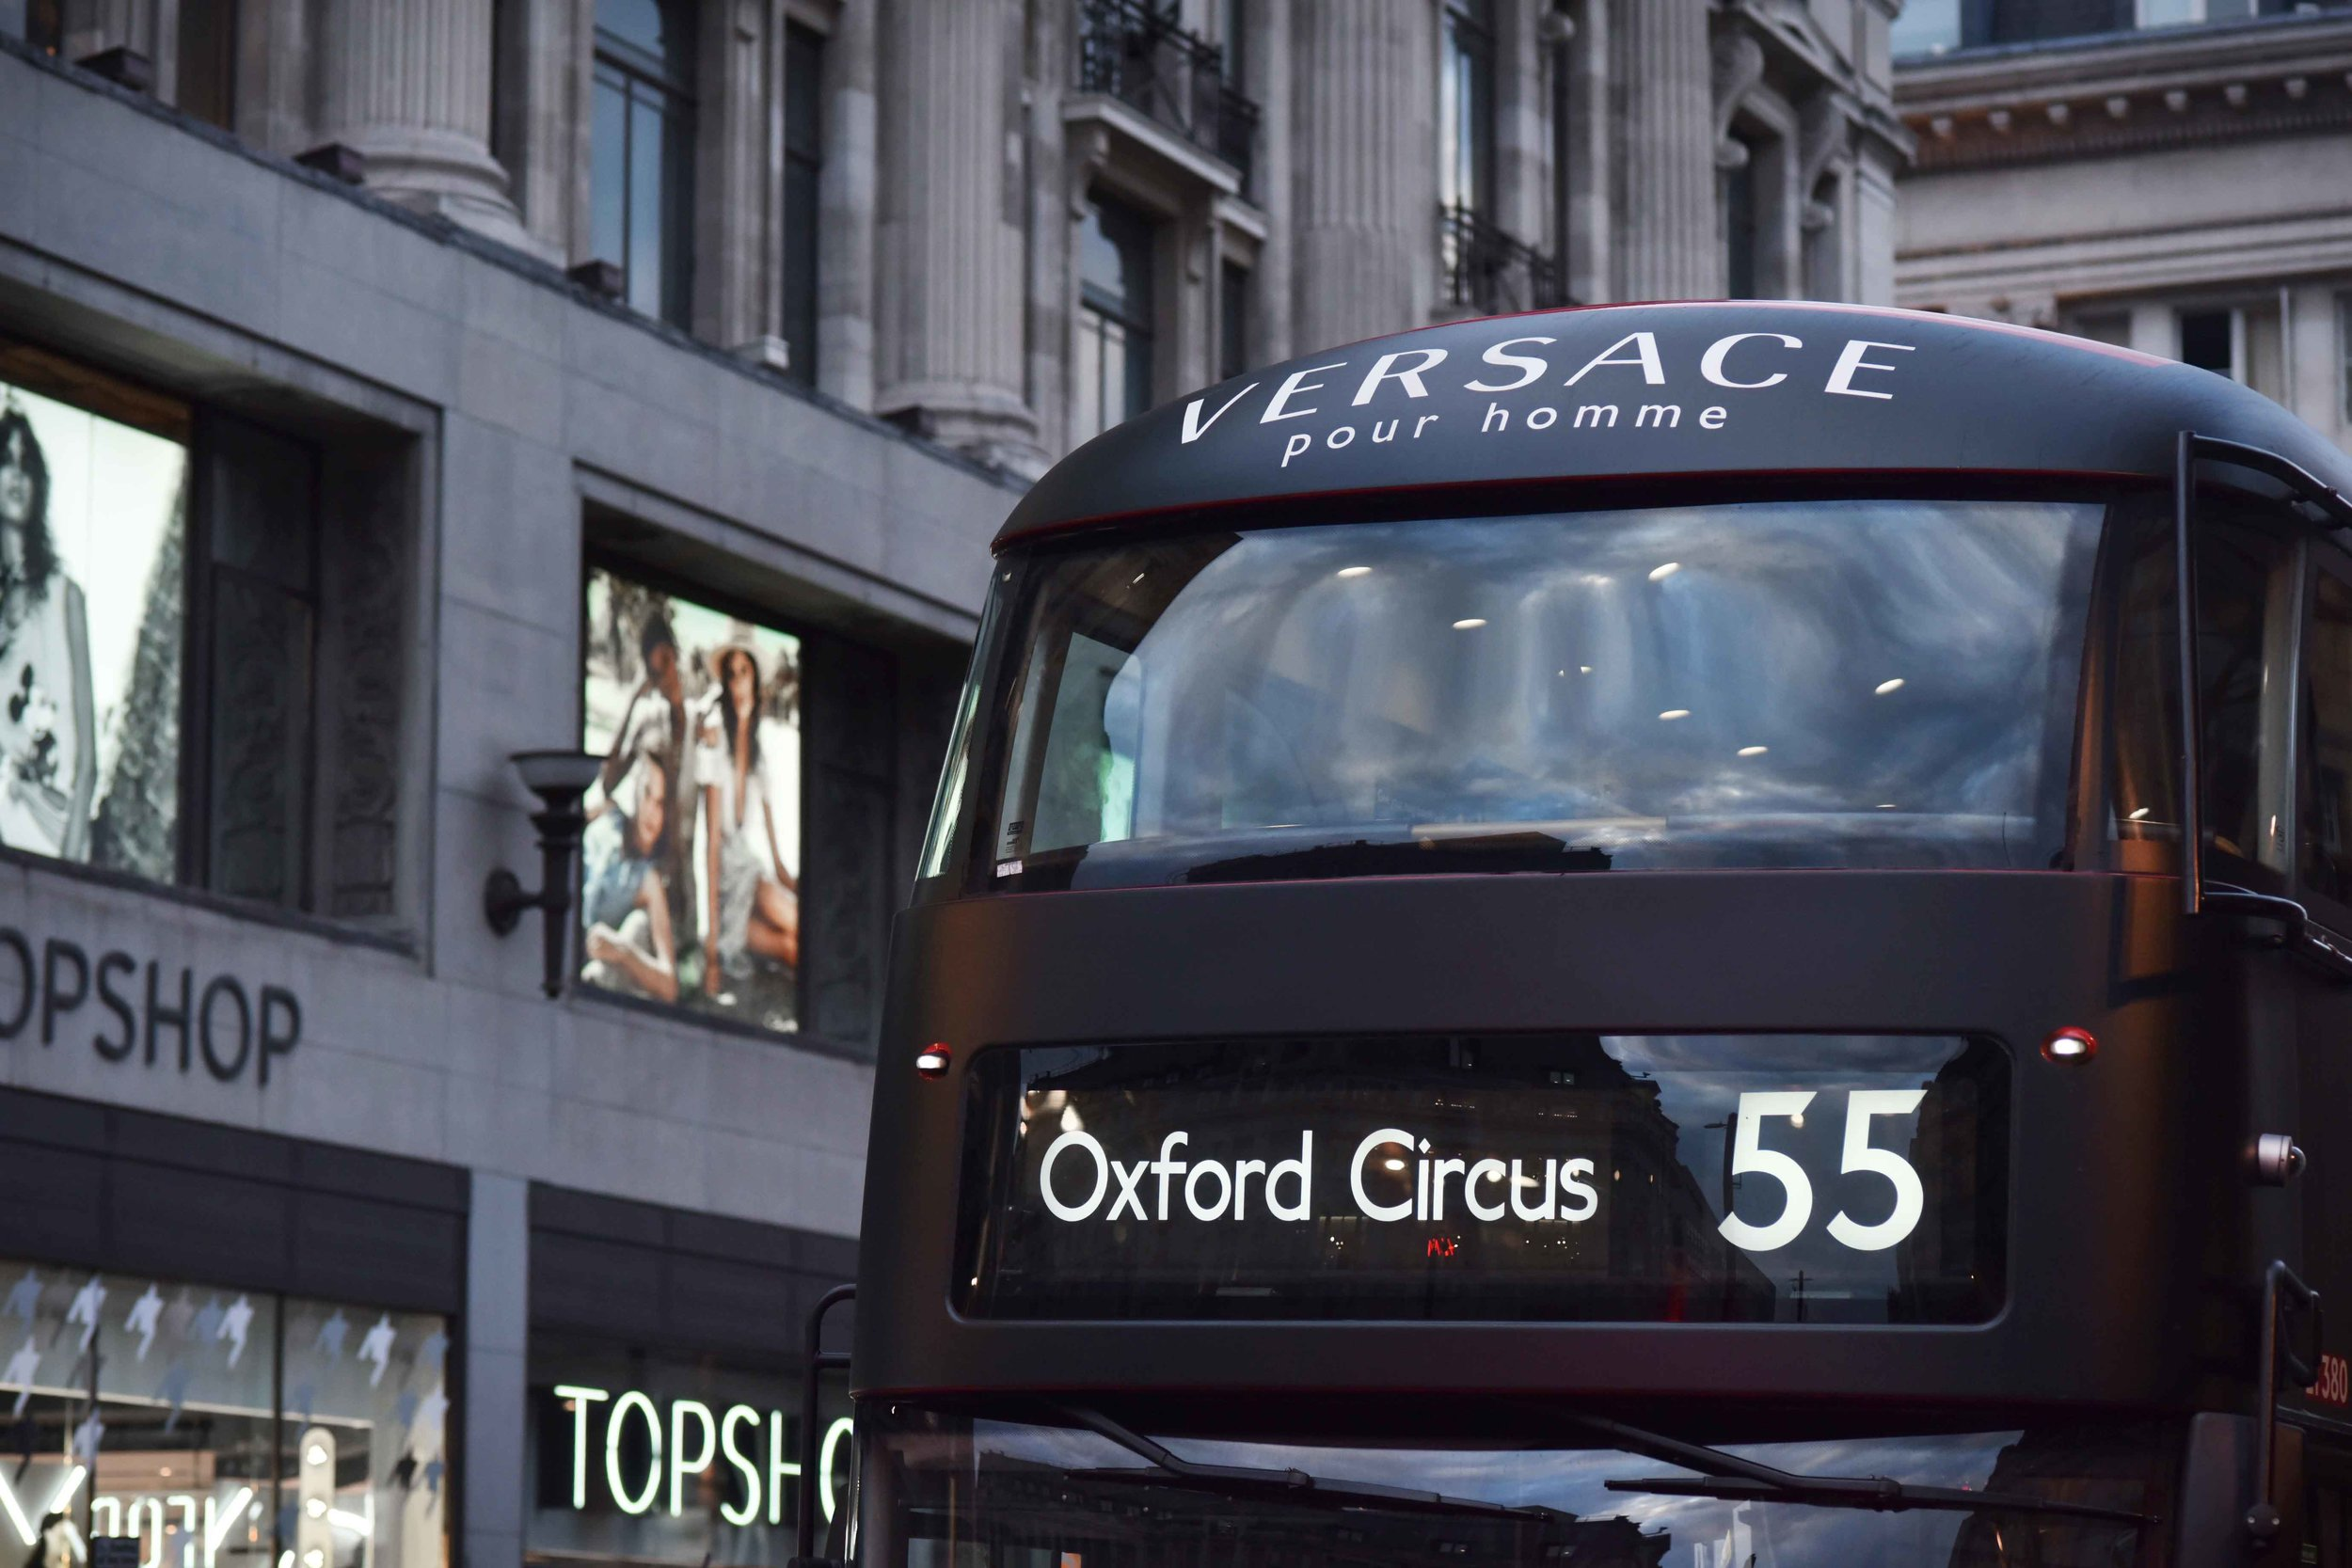 Oxford Circus, London, U.K. Image©sourcingstyle.com